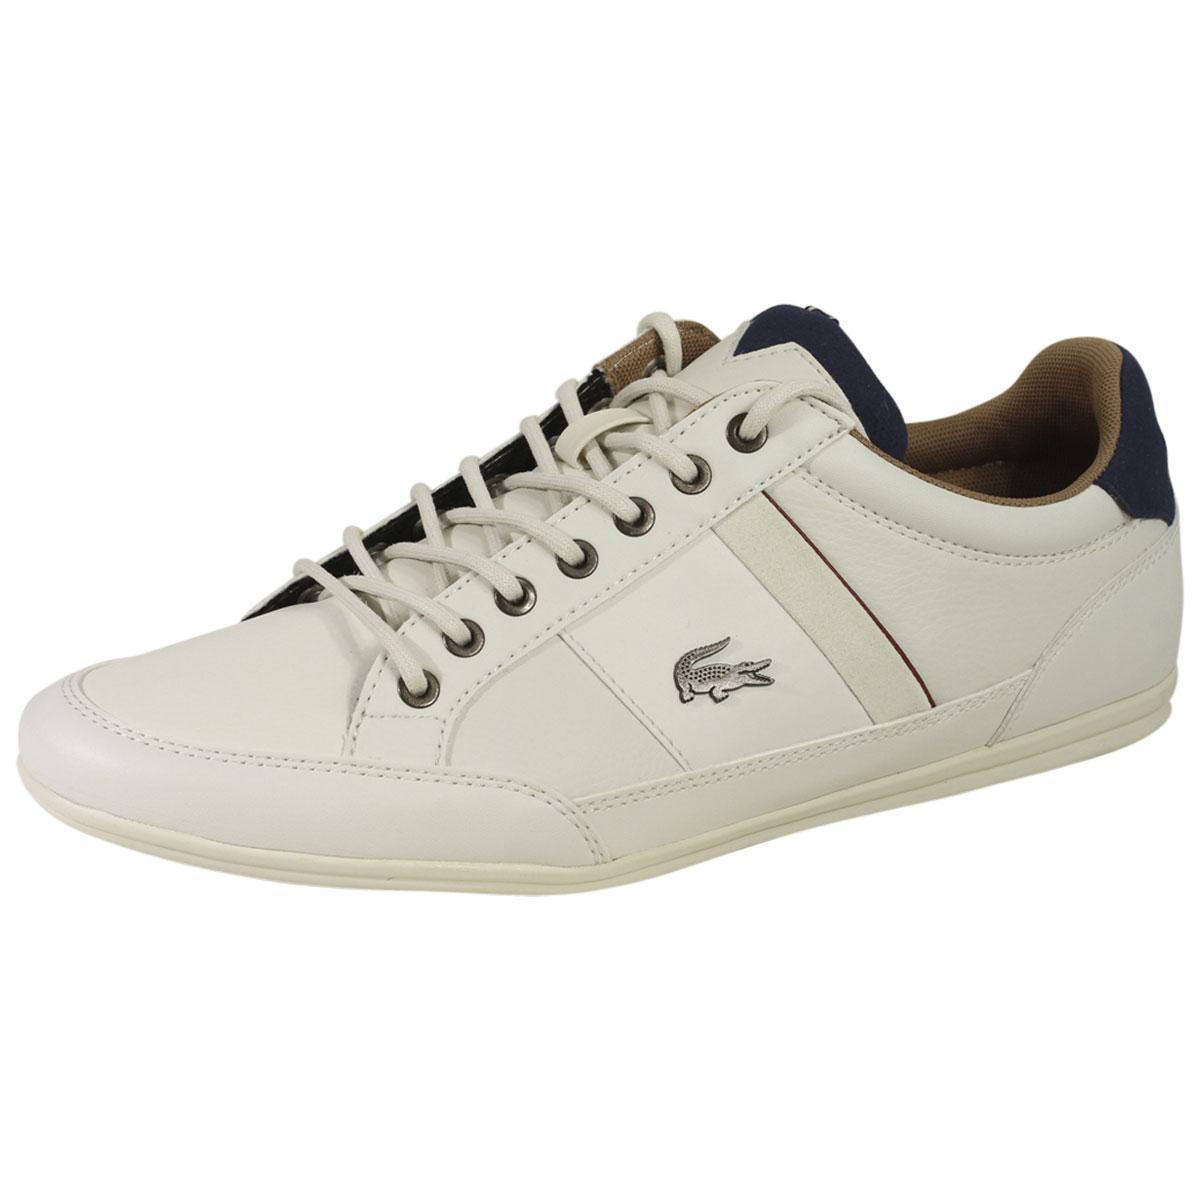 de0688451 Lacoste Men s Chaymon-118 Low-Top Sneakers Shoes